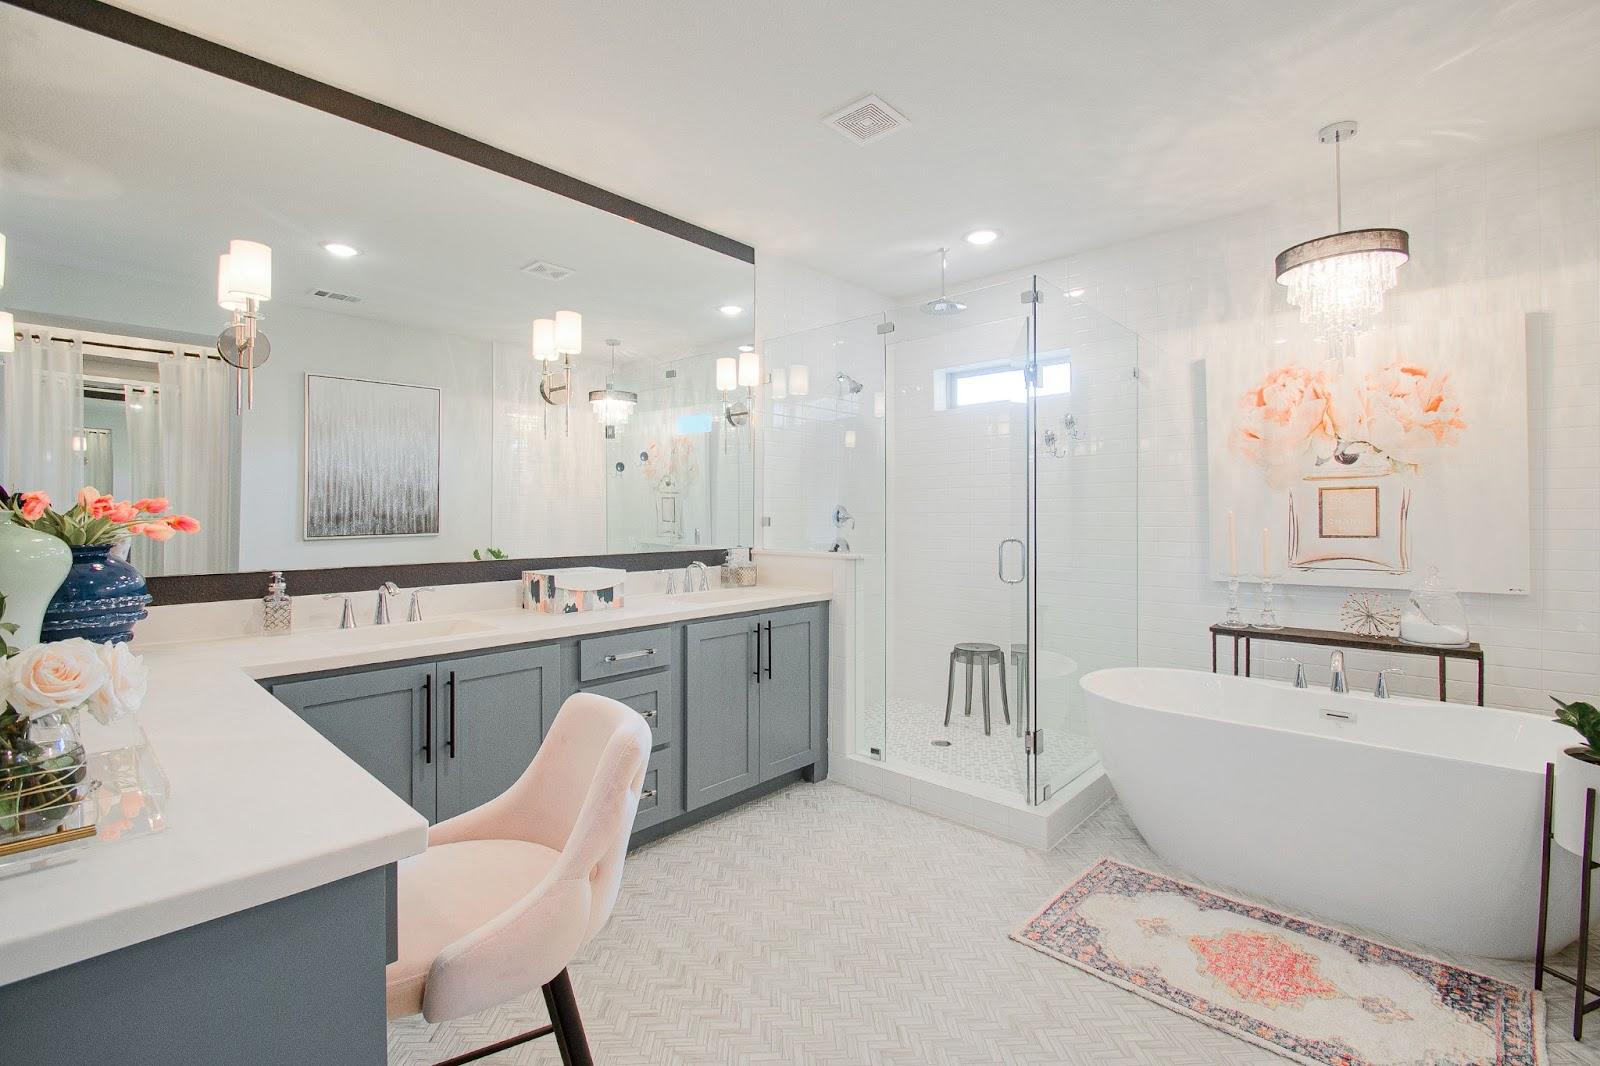 builder-grade home after custom interior design vanity sconces free standing tub decorated